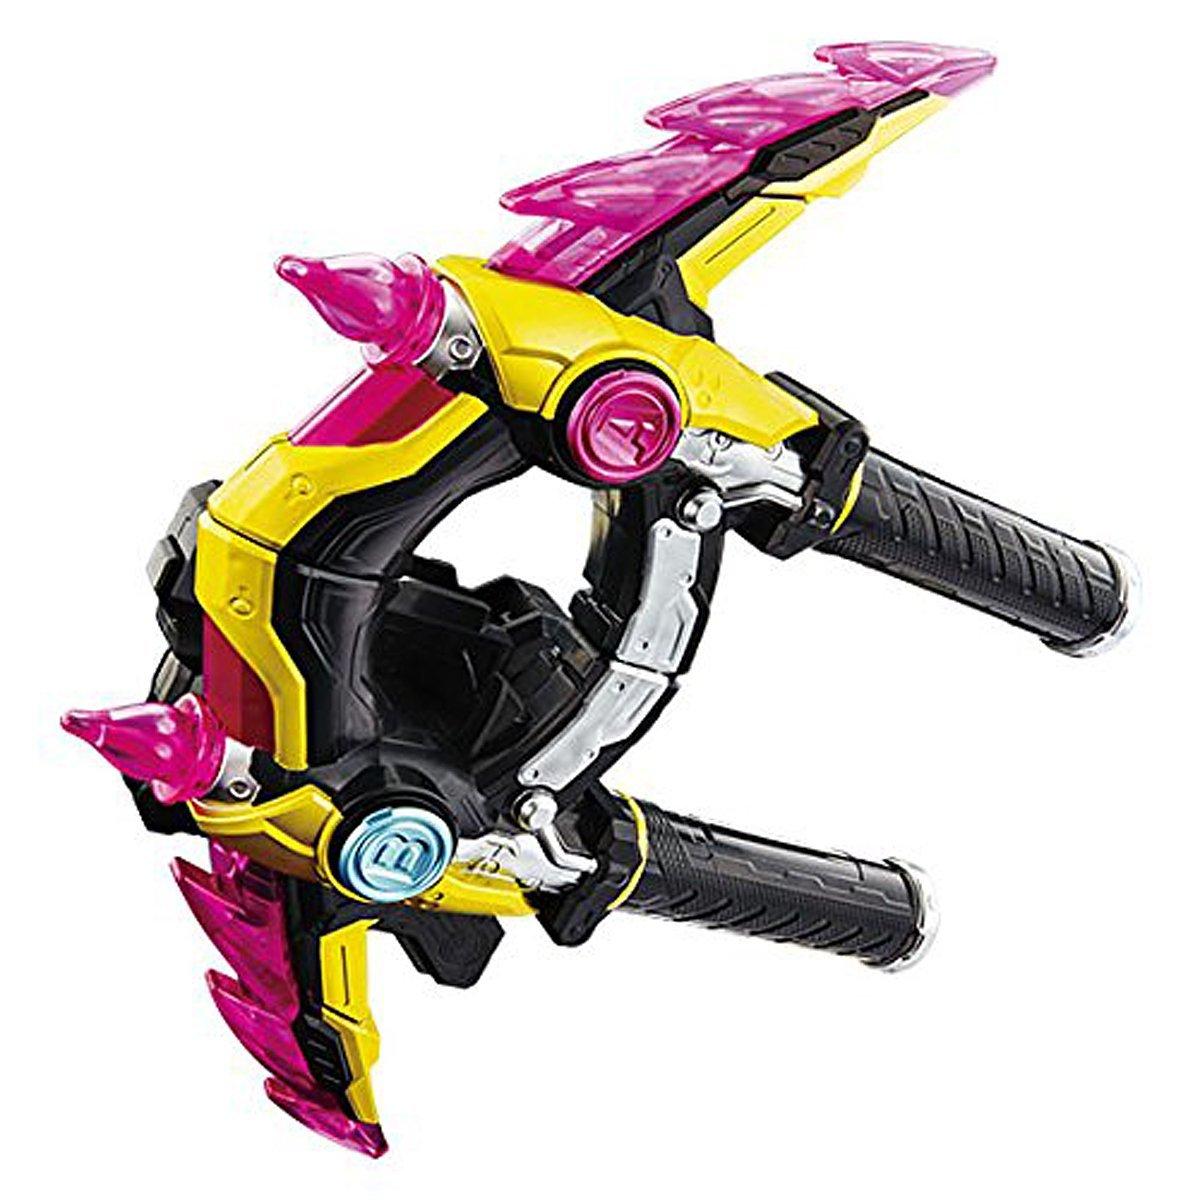 Bandai Kamen Rider EX-AID DX Gashacon Key Slasher